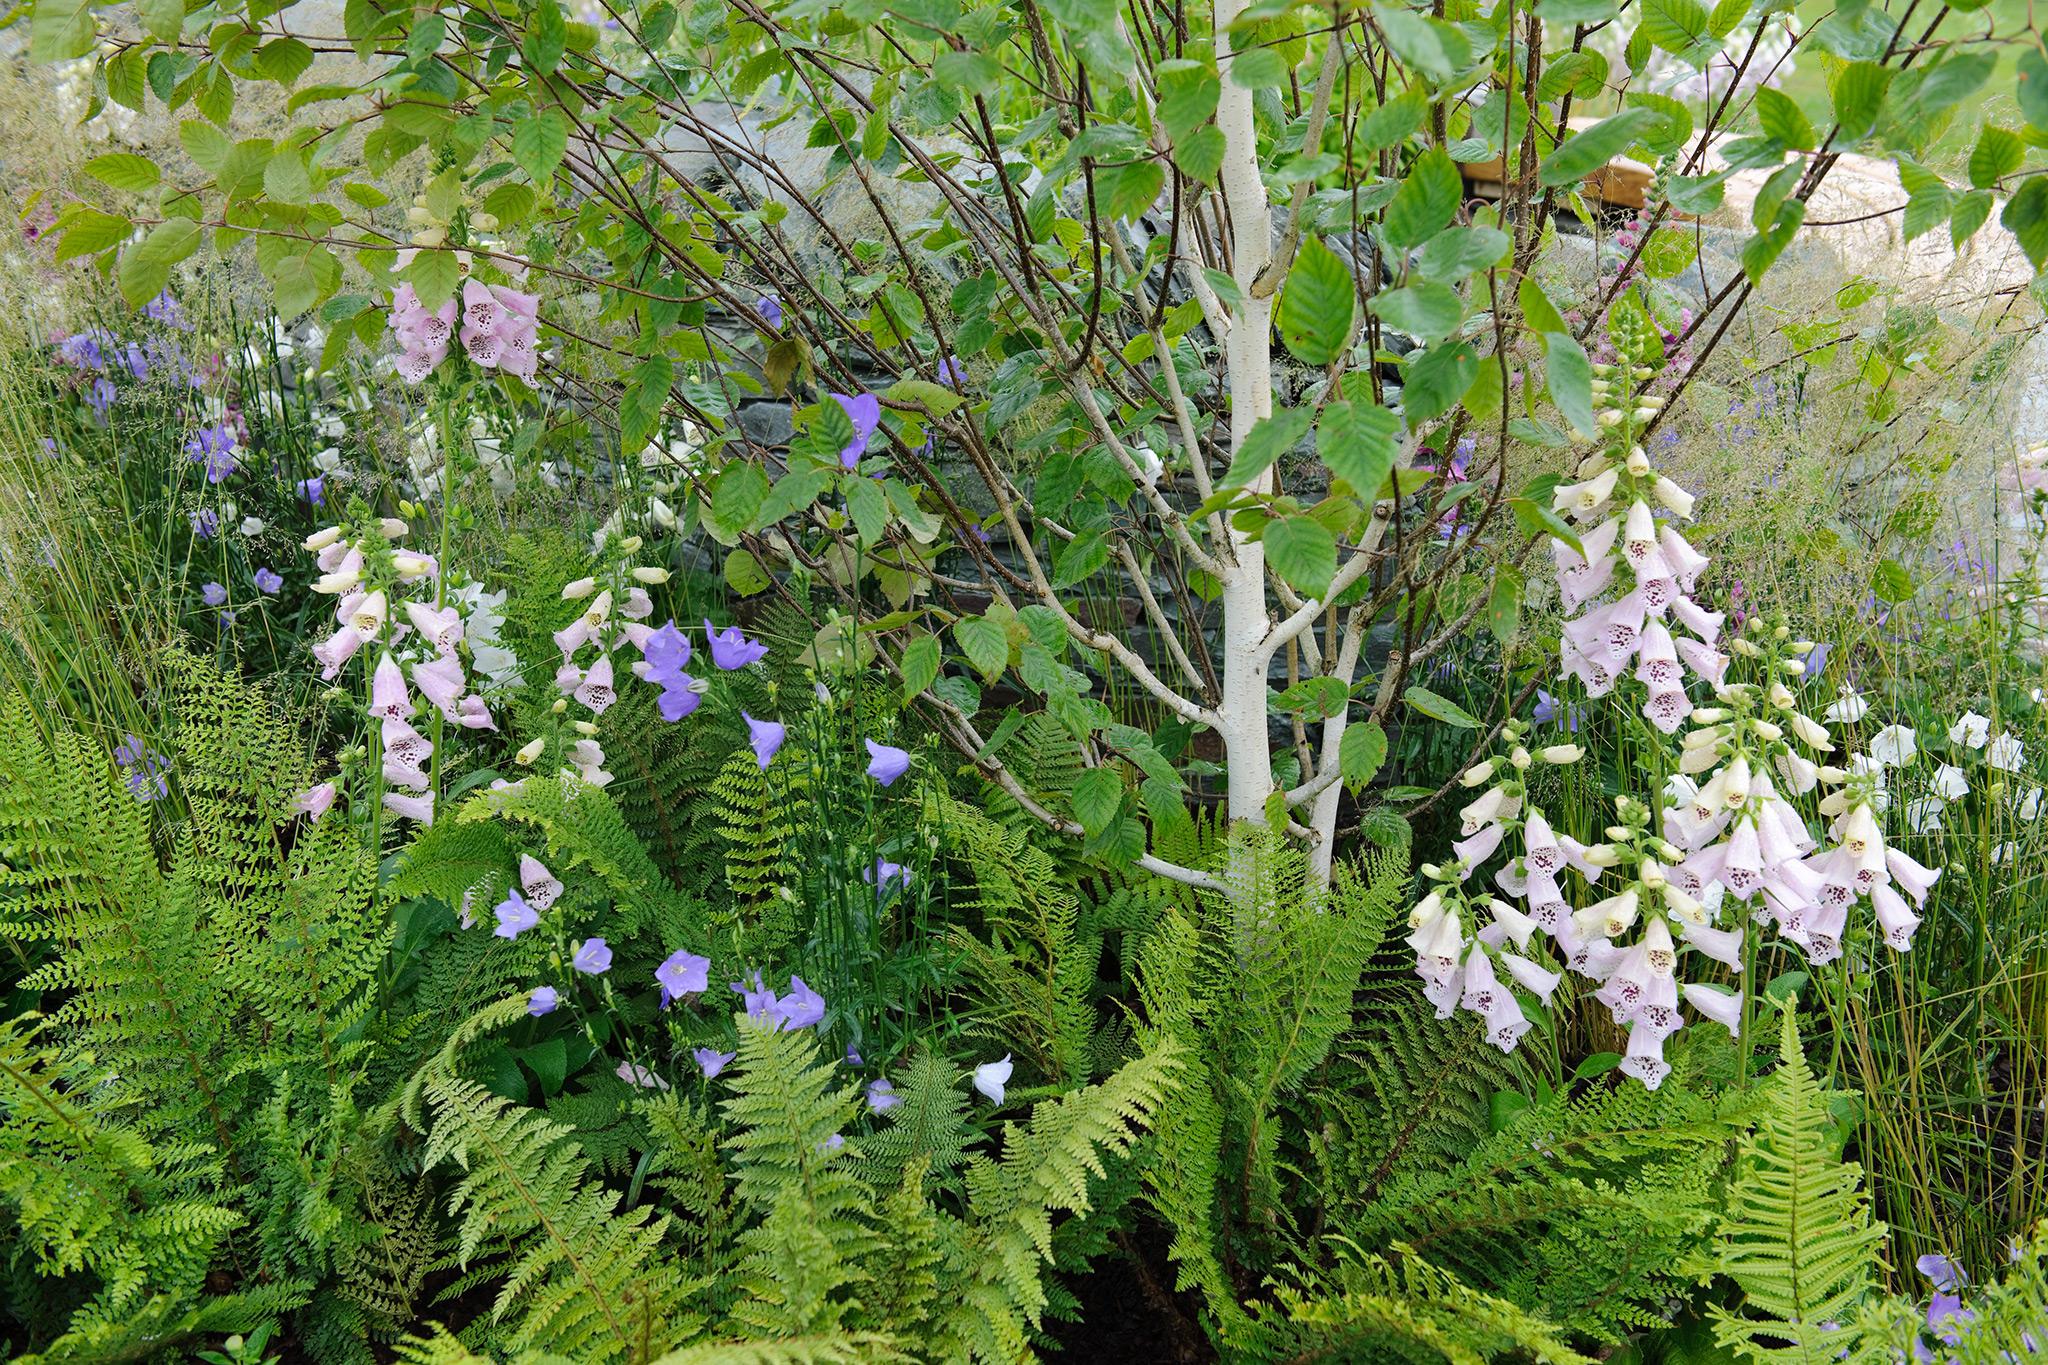 Silver birch Betula utilis